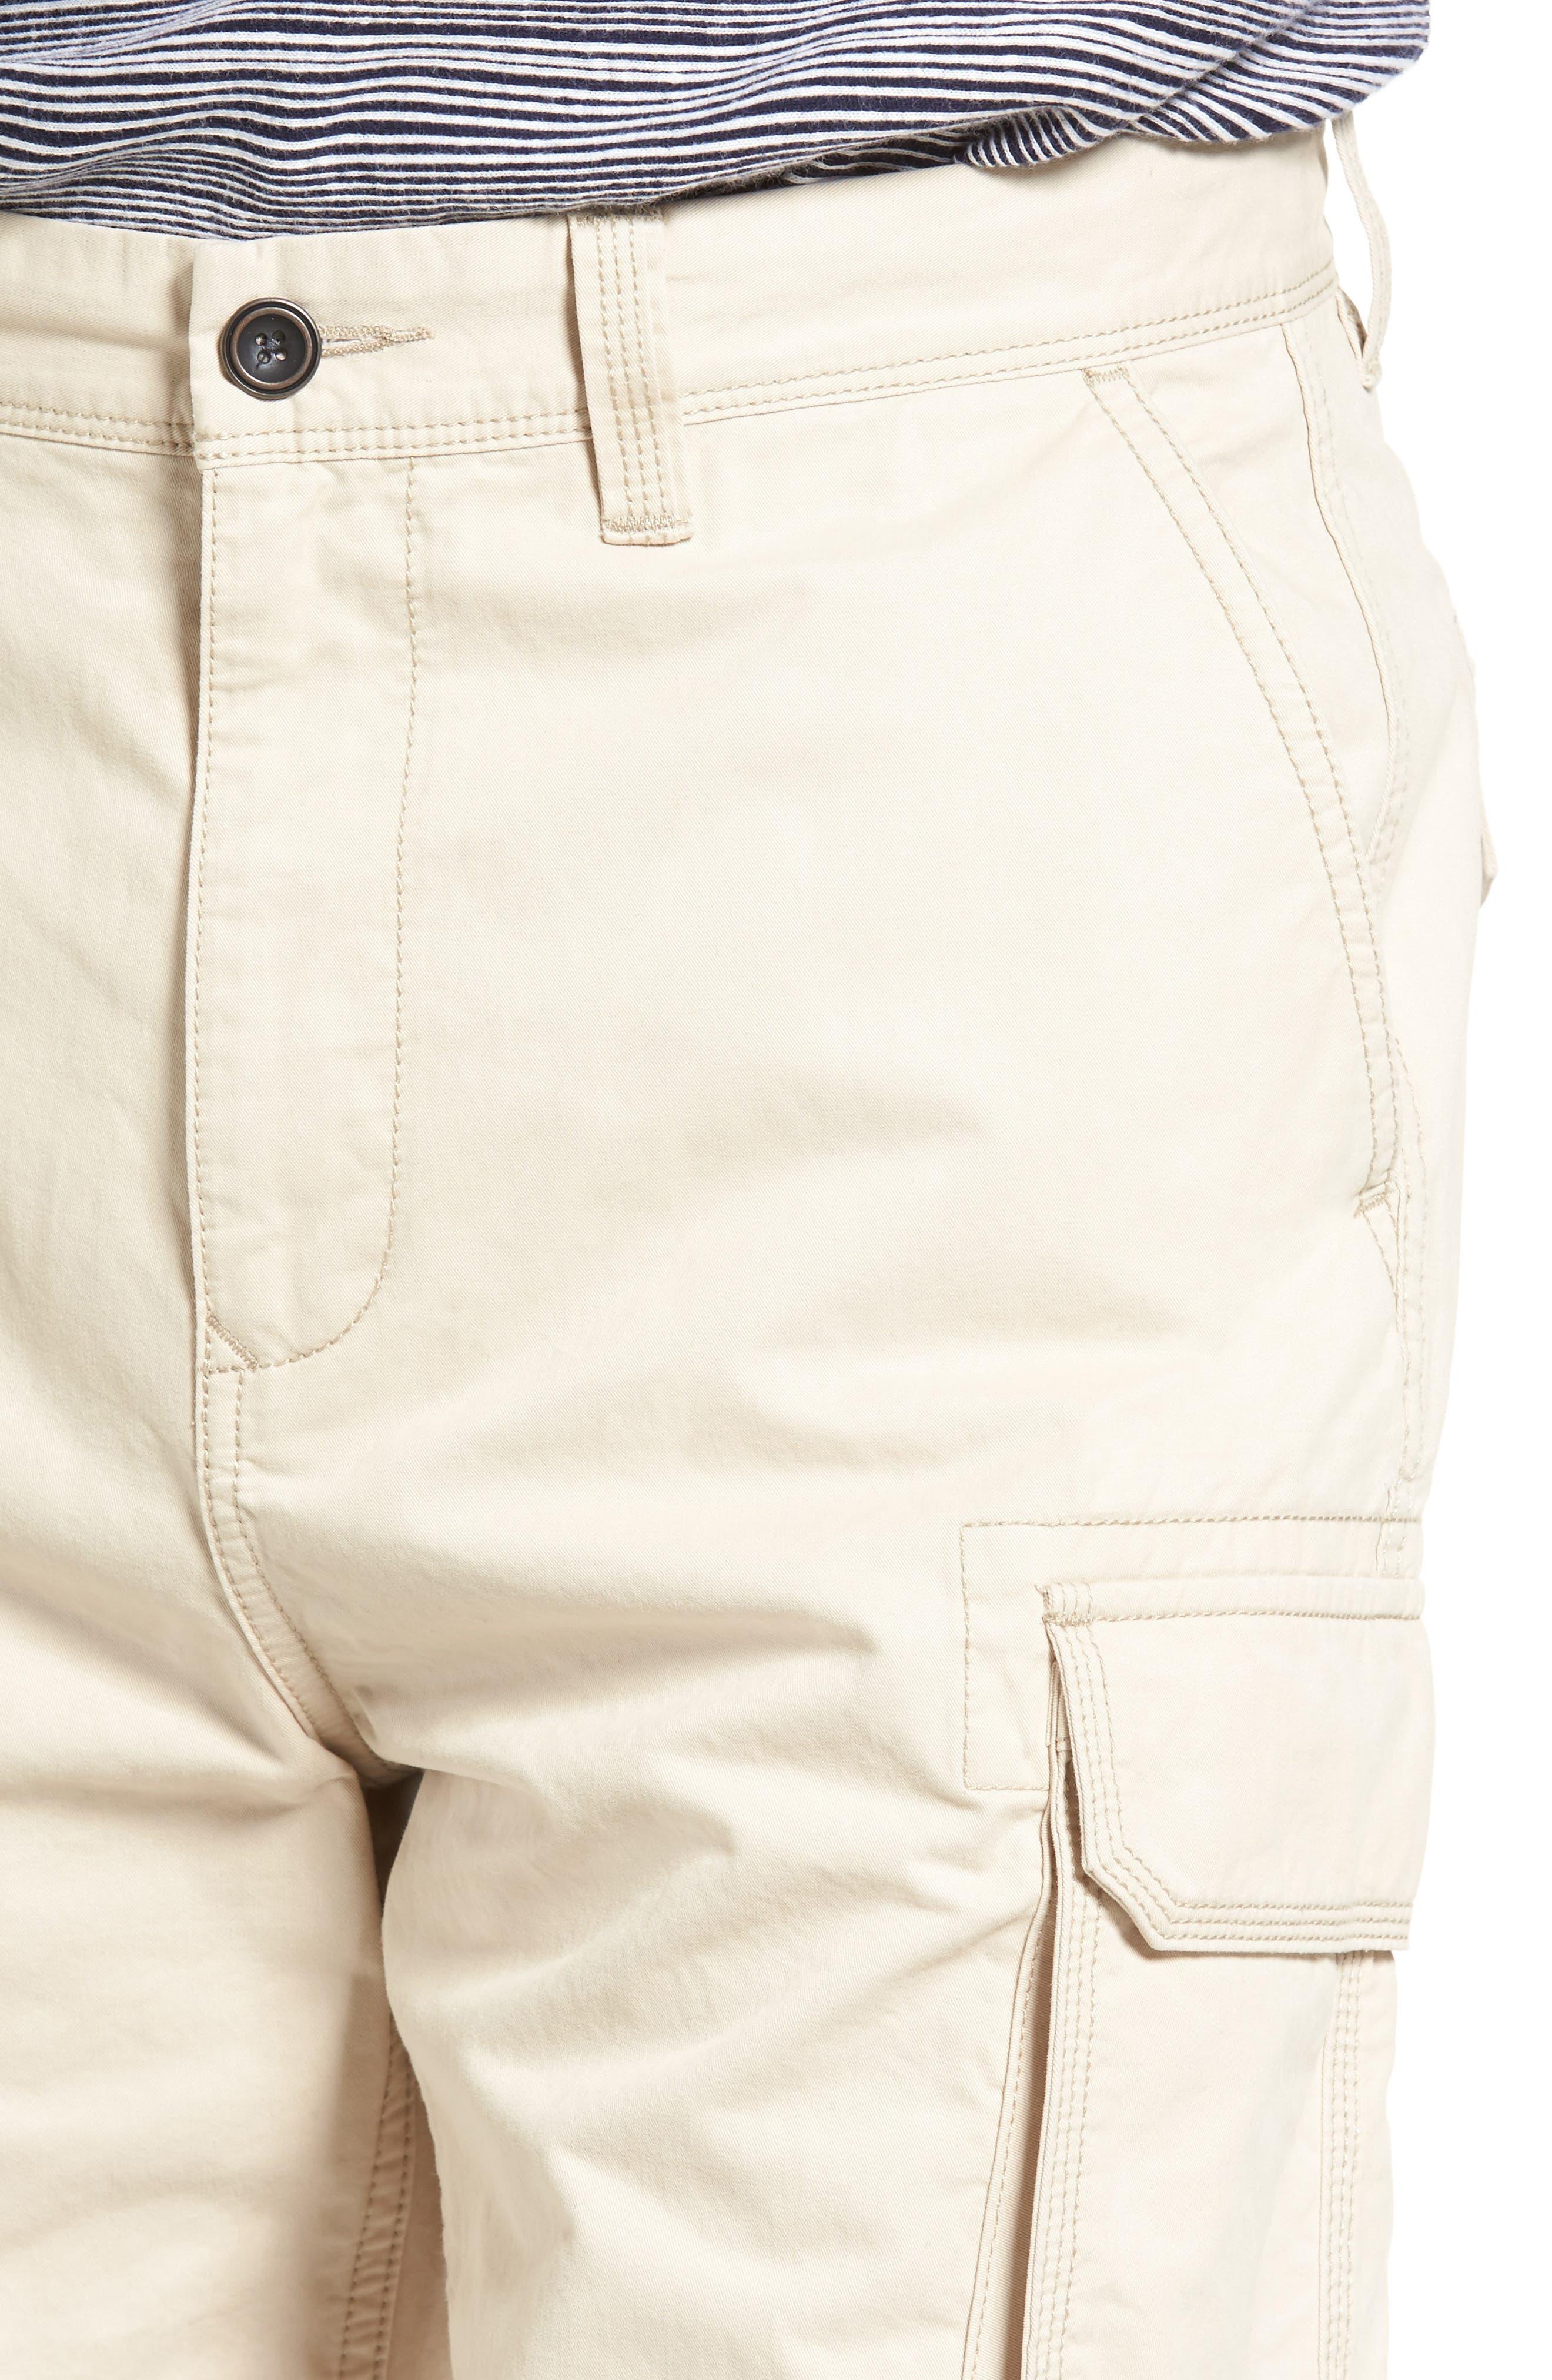 Homewood Utility Shorts,                             Alternate thumbnail 4, color,                             252